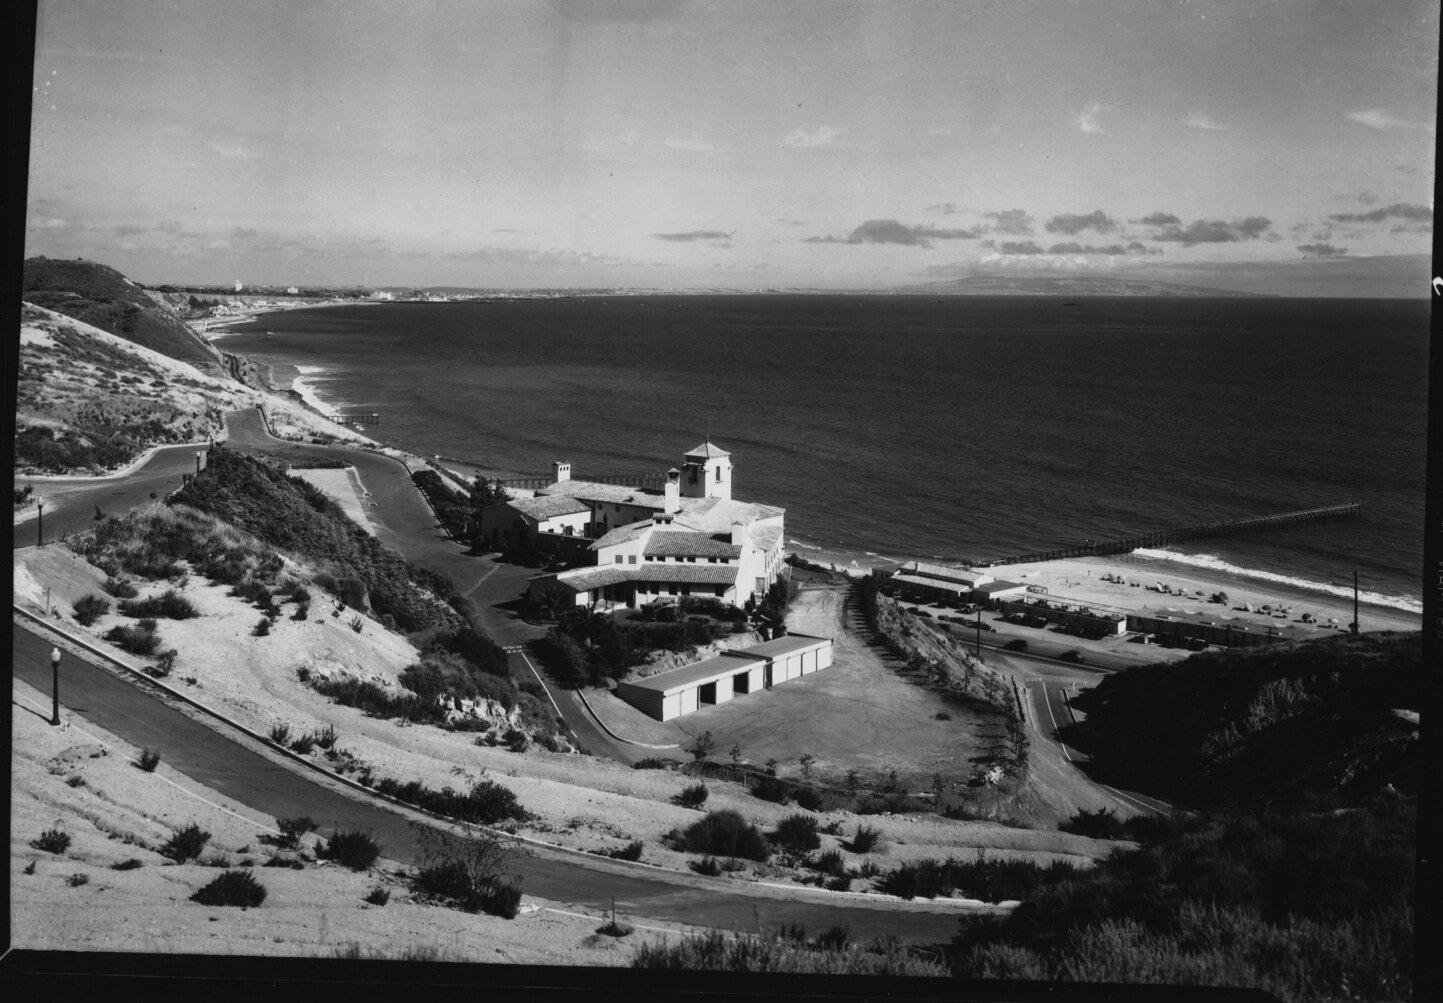 Bel-Air Bay Club 1927